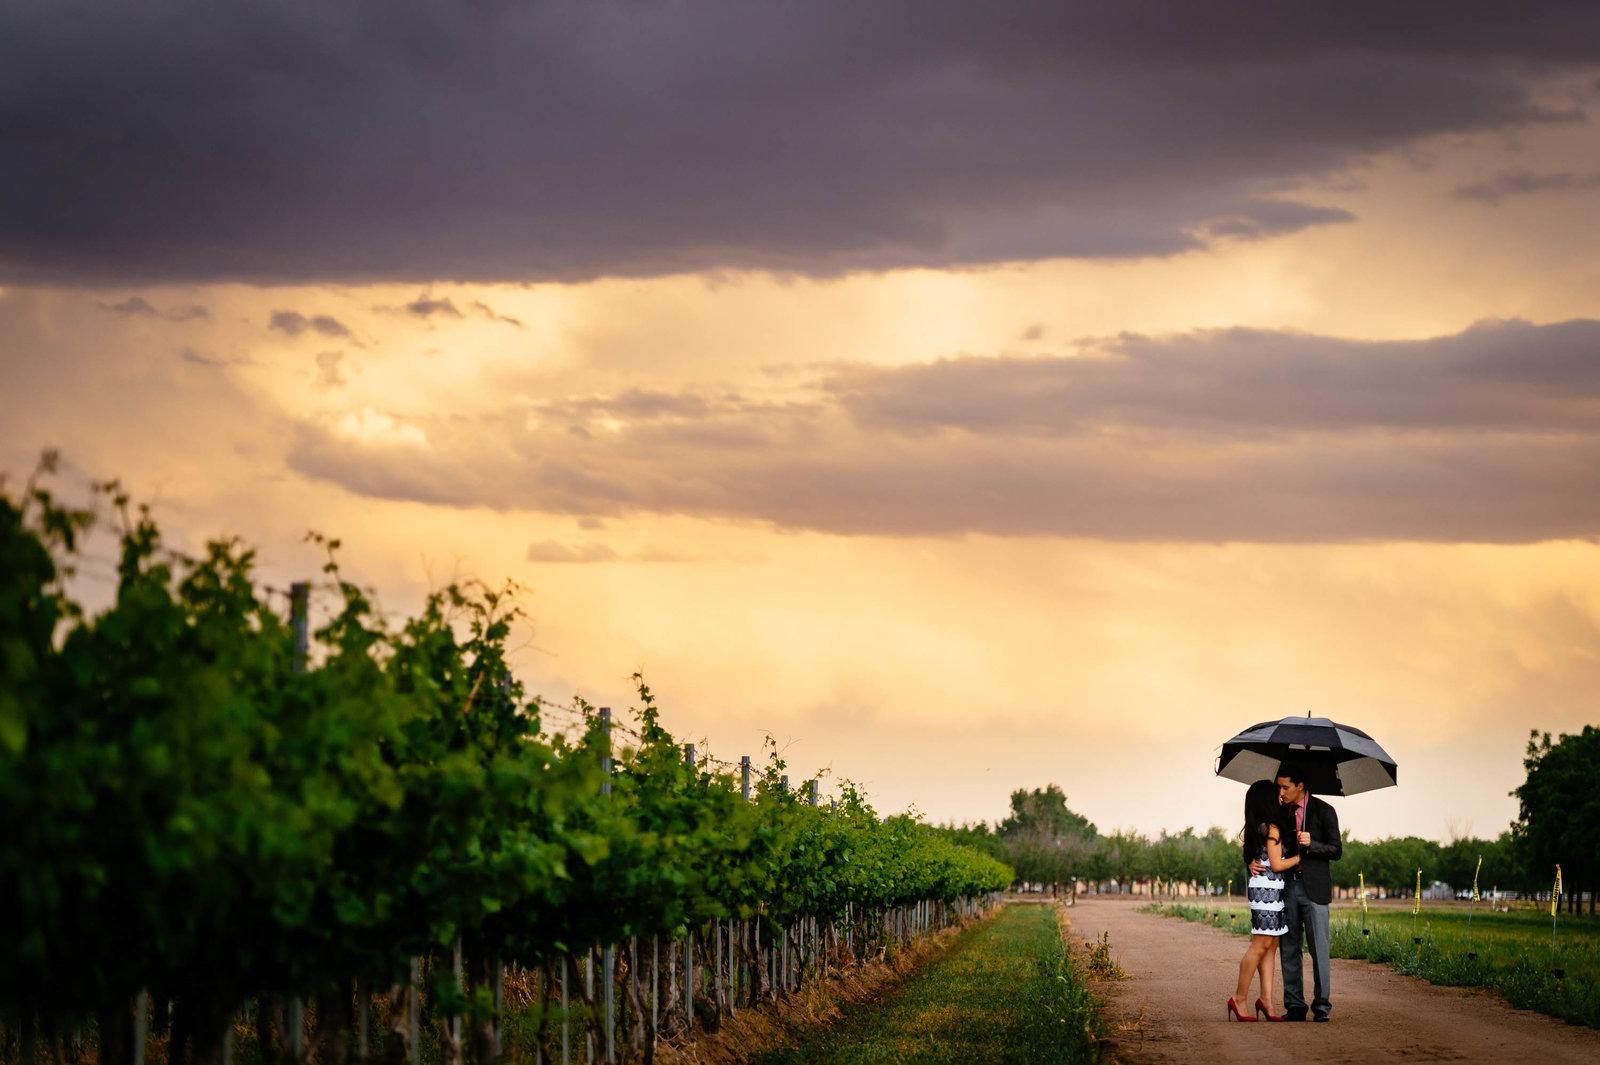 072-El-paso-wedding-photographer-MaJe_0113